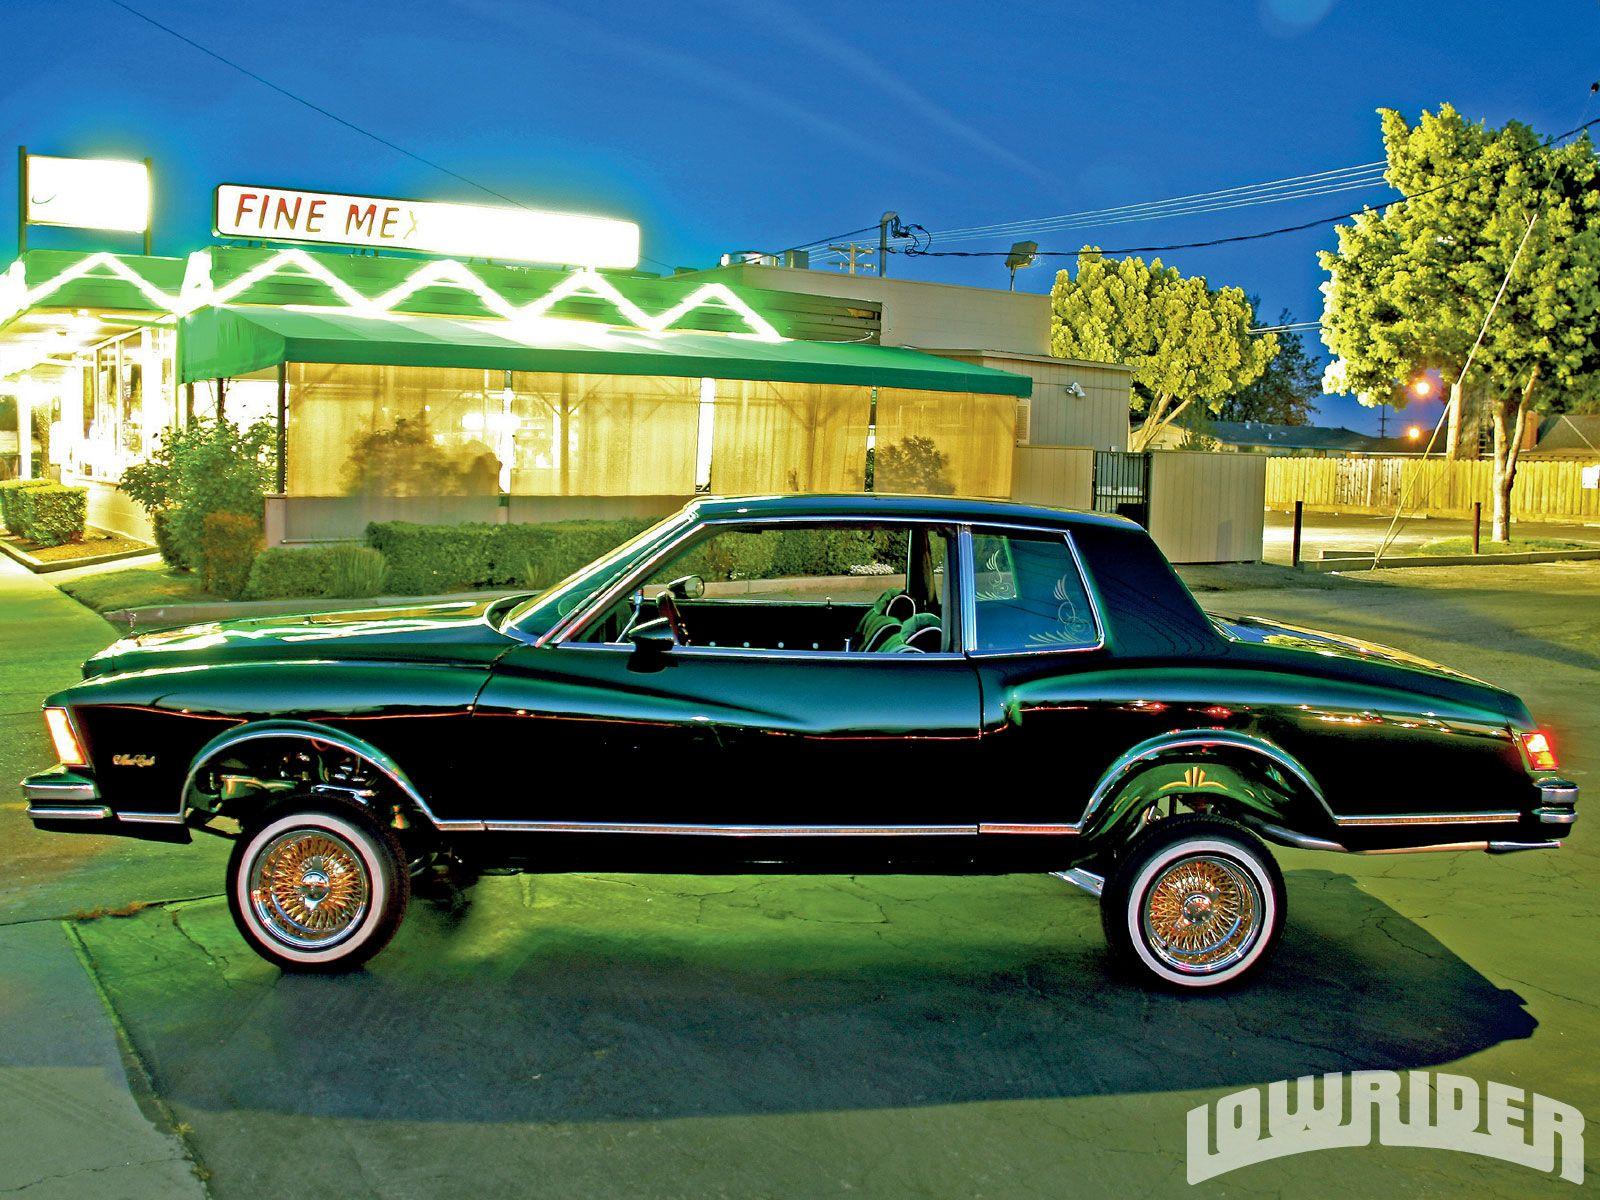 1979 Chevrolet Monte Carlo Lowrider Magazine Chevrolet Monte